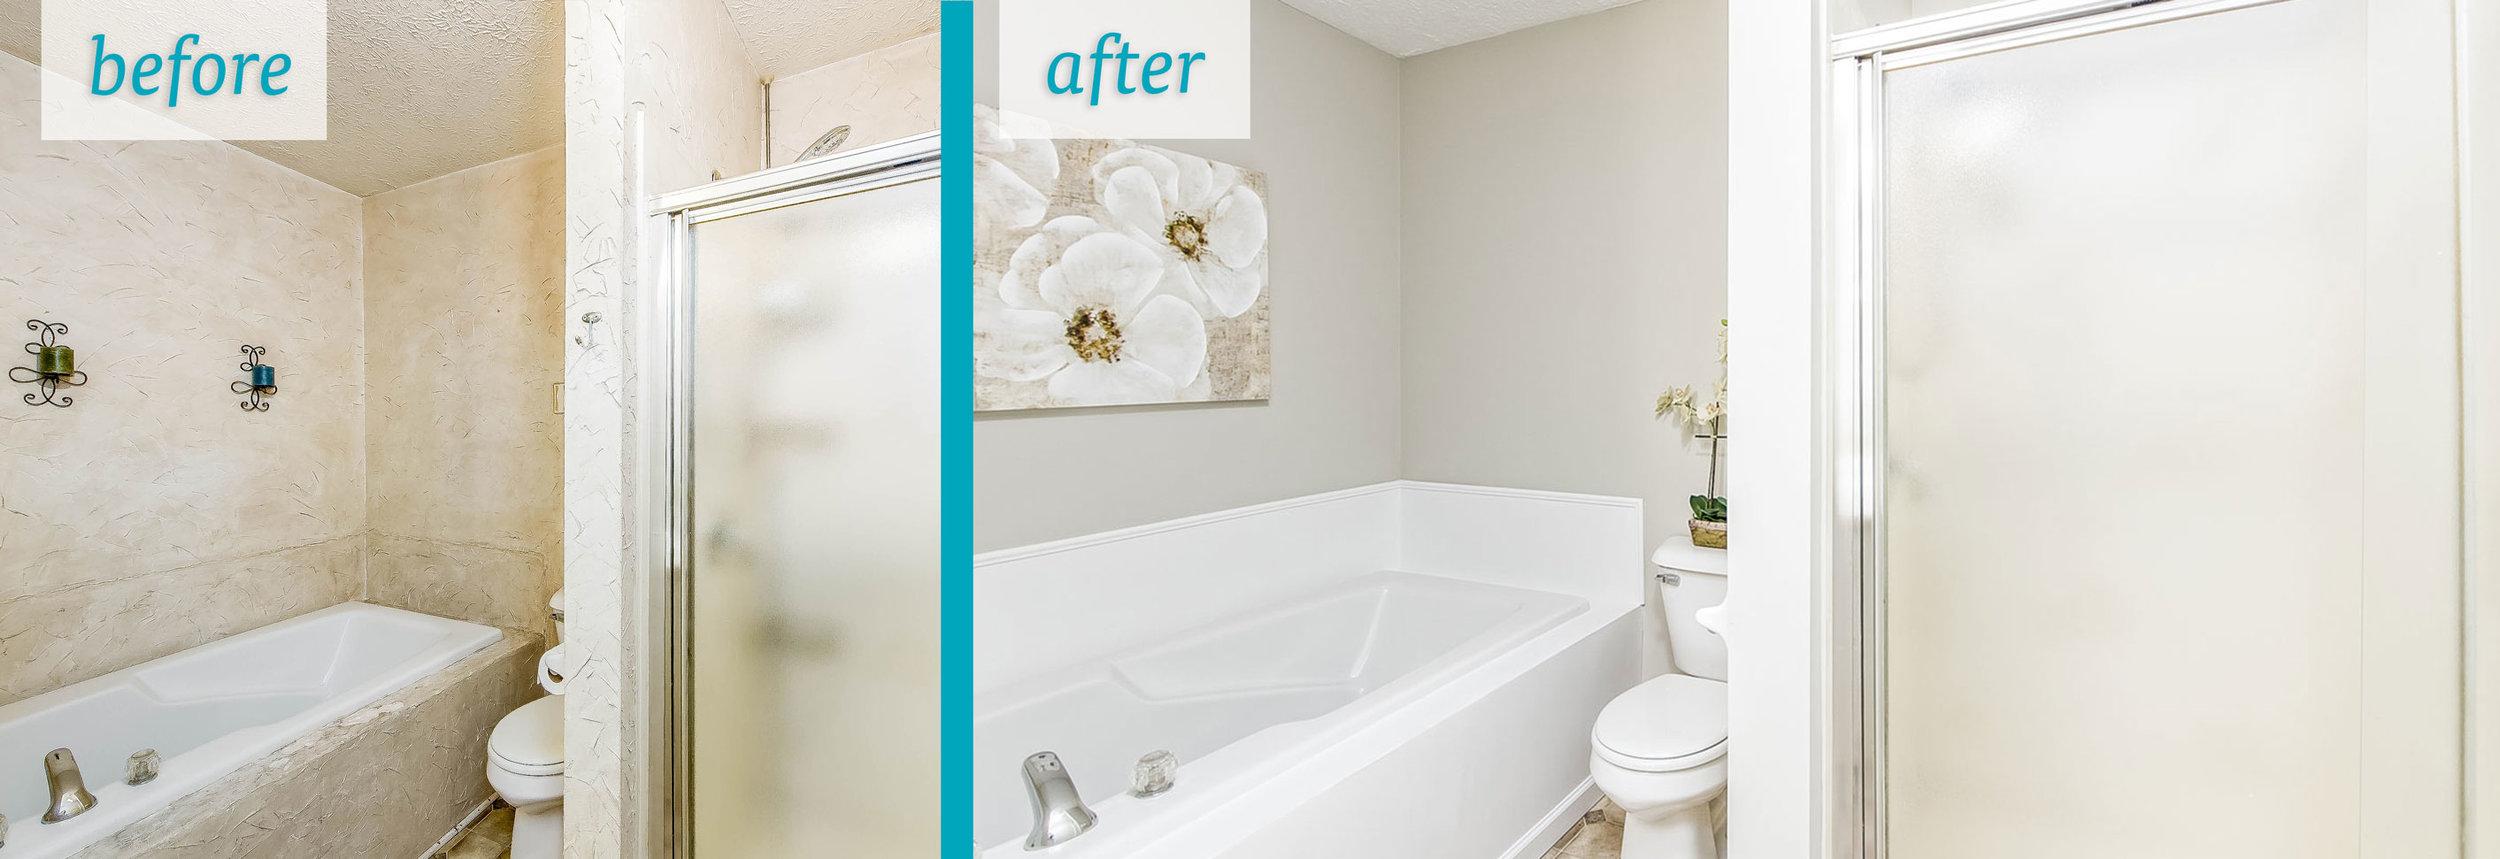 larkfield-main3-bath-before-after.jpg